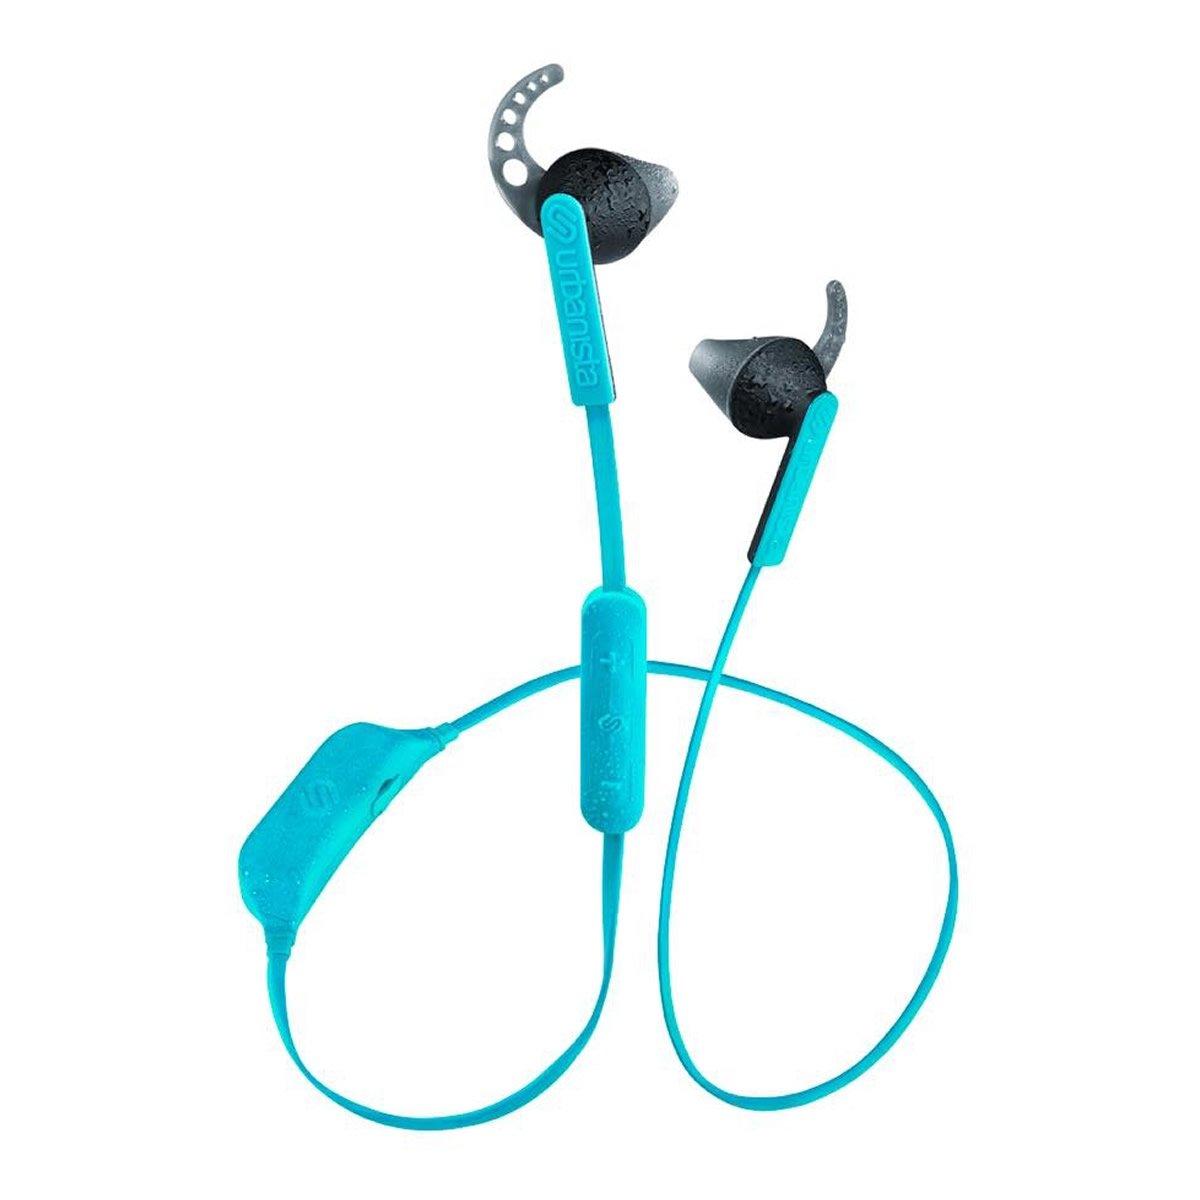 Urbanista Boston Bluetooth Sport Earphones with Mic Coral Island/Turquoise